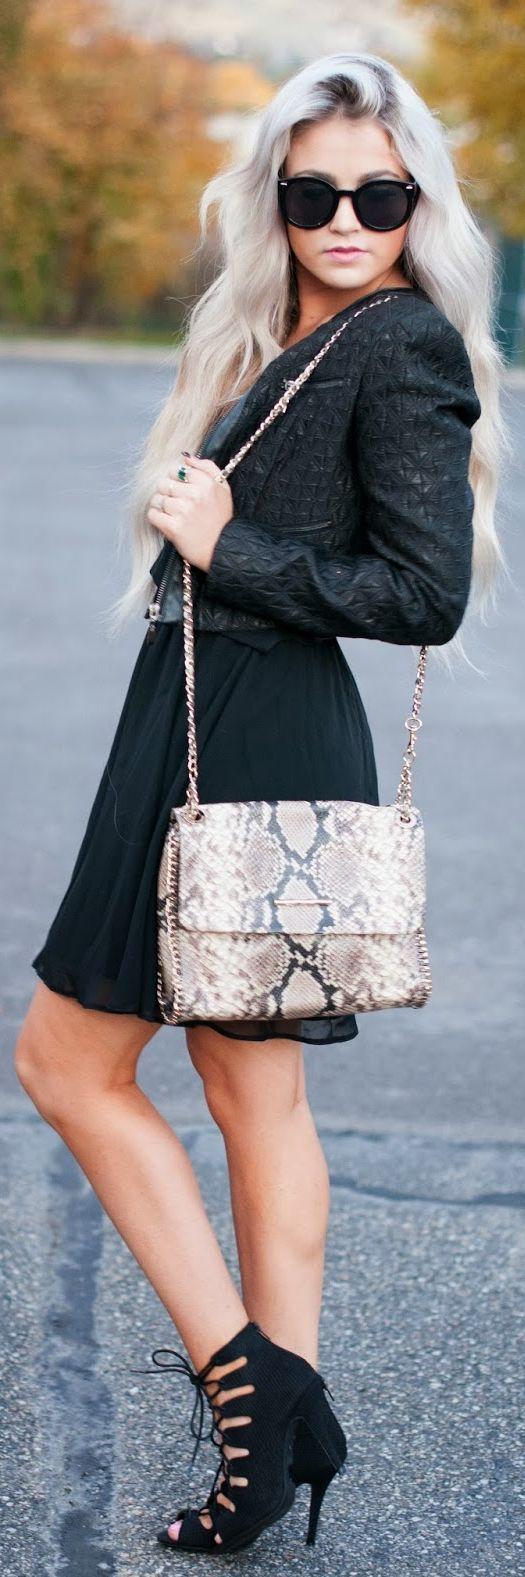 #Little #Black #Dress by Cara Loren.  Elaine Turner python bag.